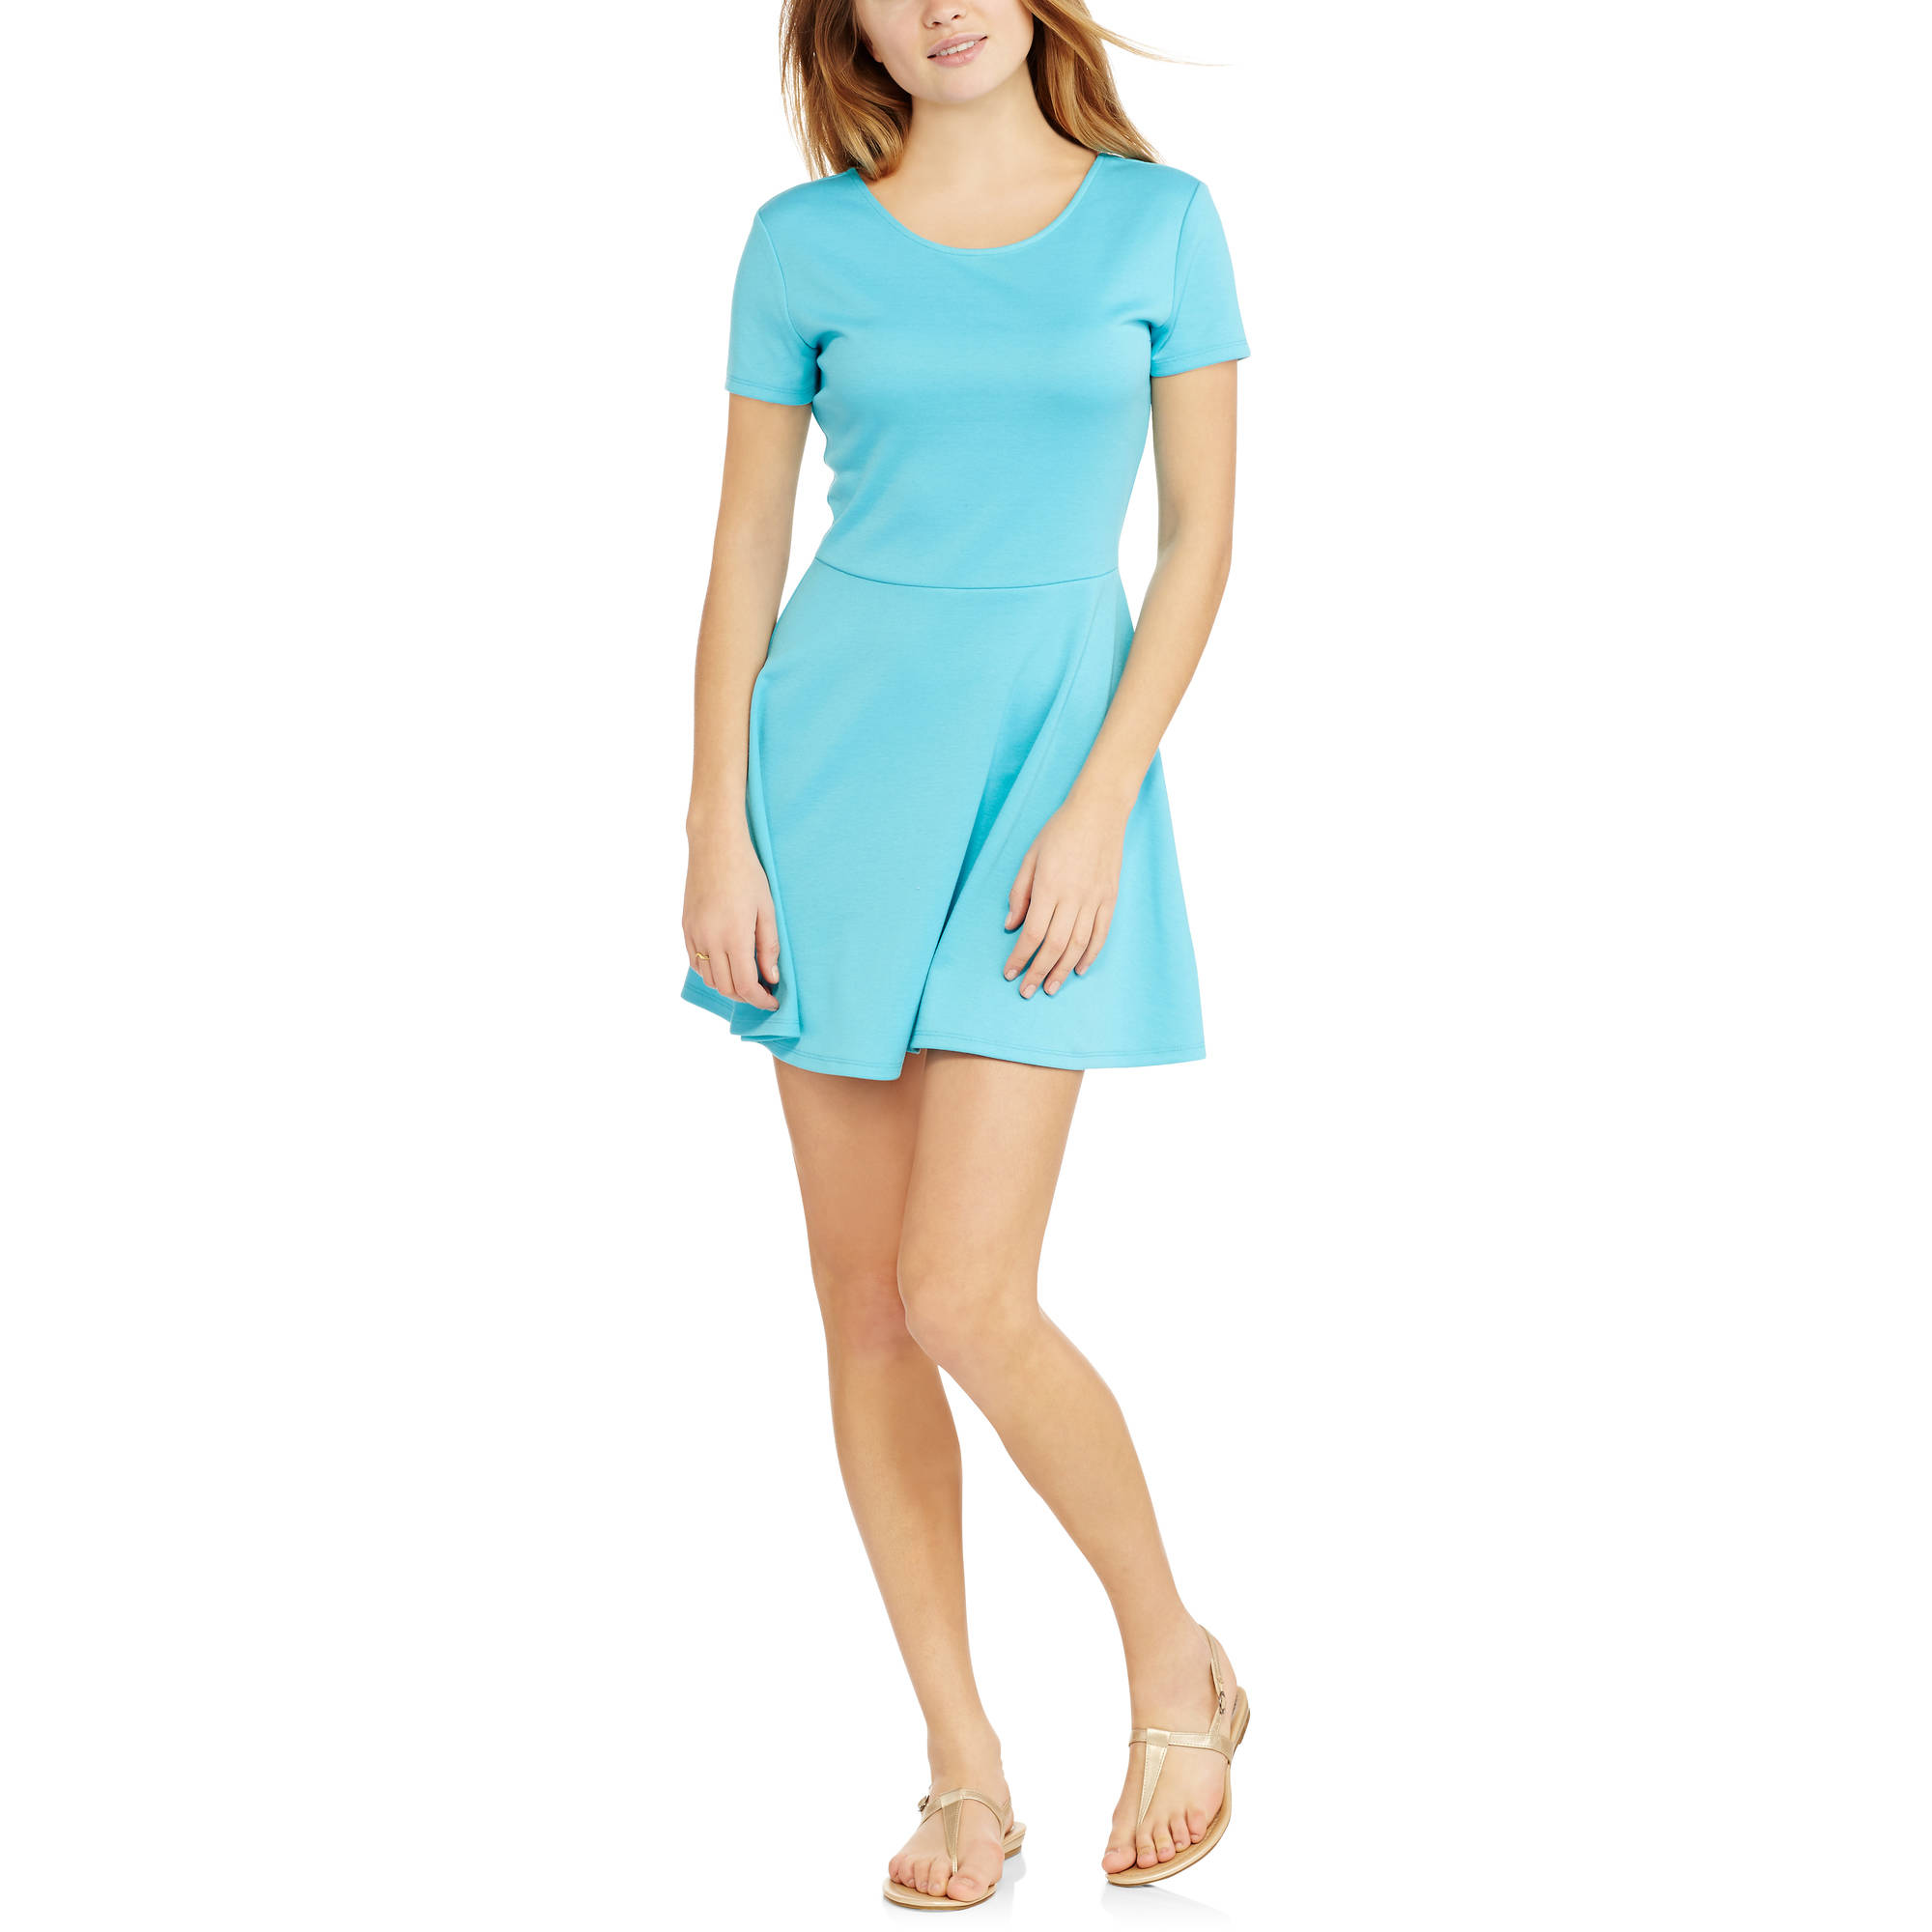 Junior Summer Dresses